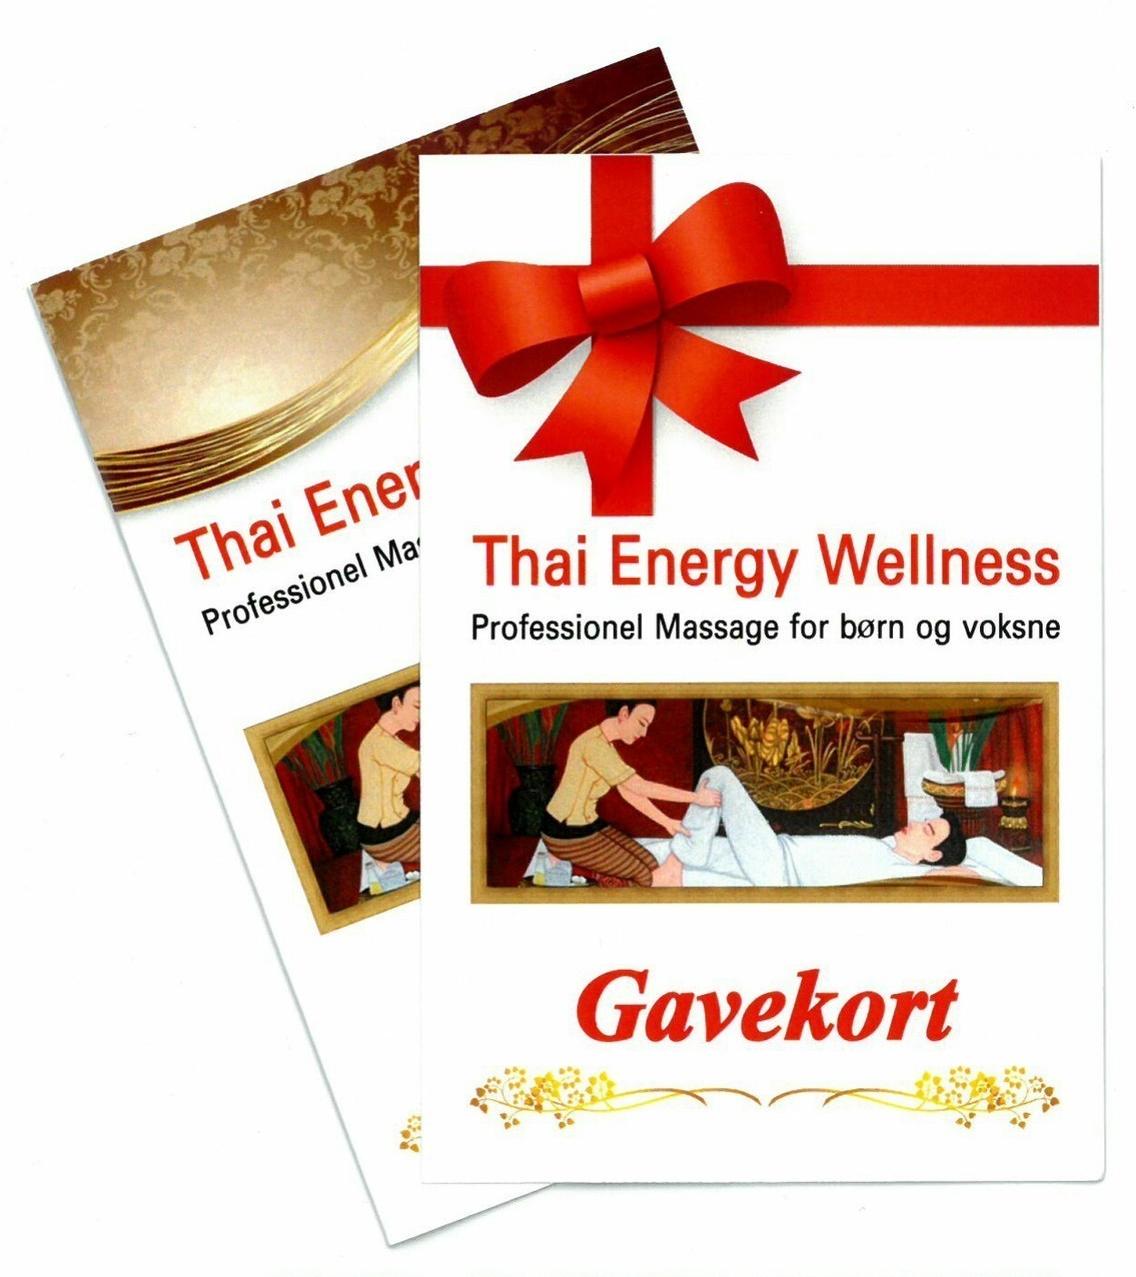 gavekort til wellness